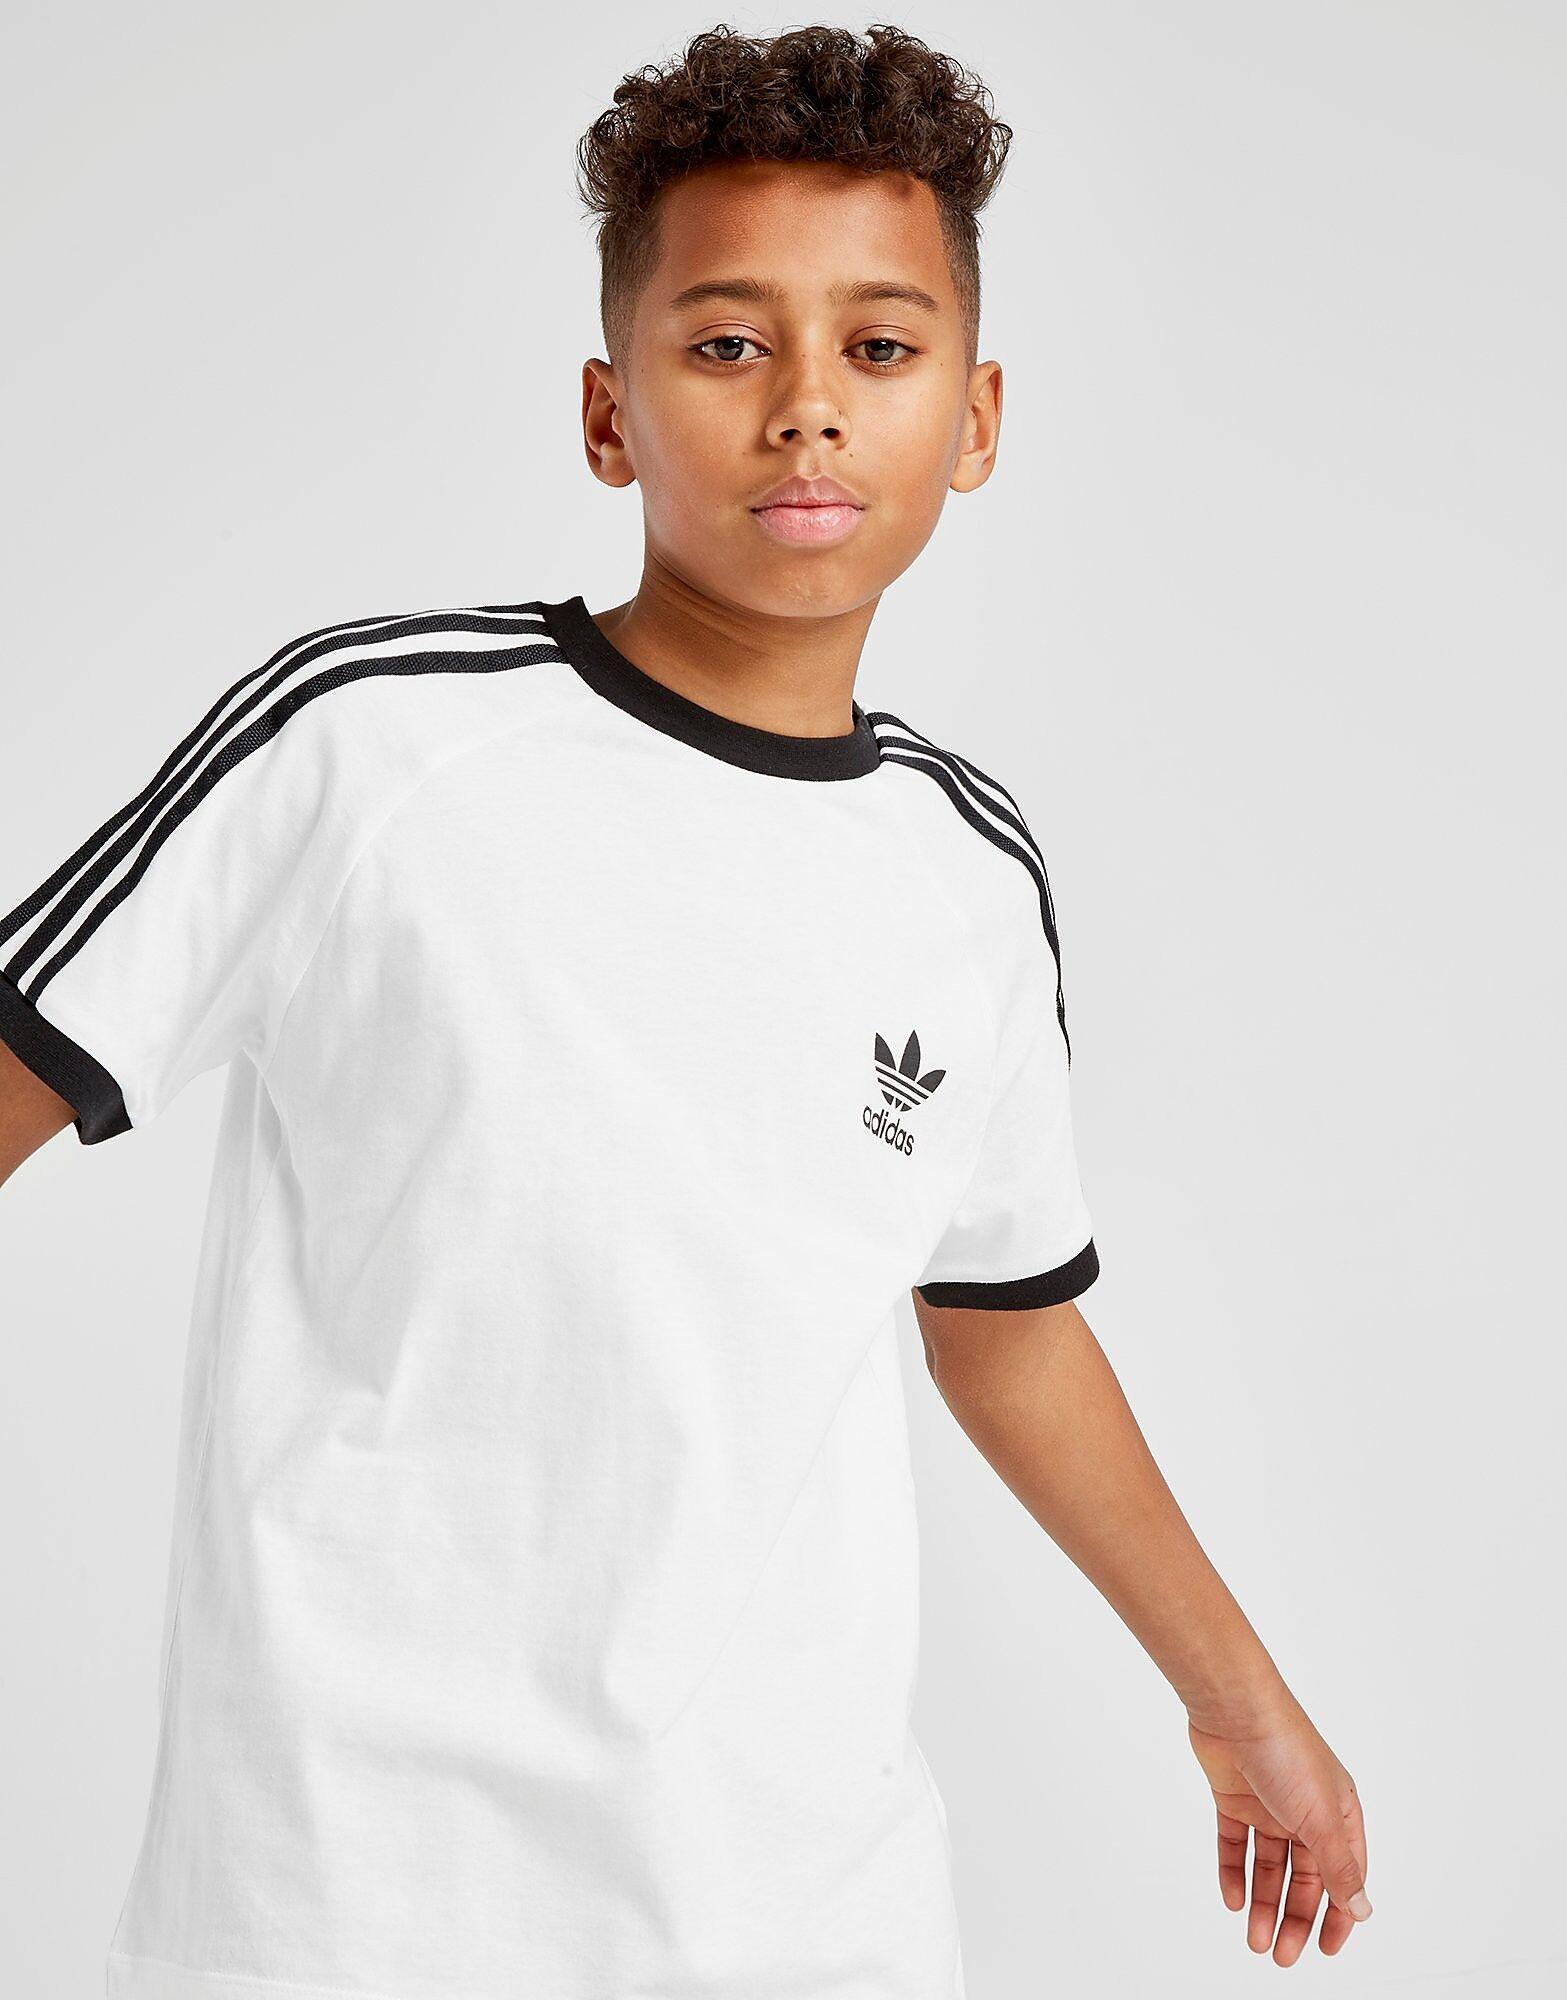 Image of Adidas Originals California T-Paita Juniorit - Only at JD - Kids, Valkoinen